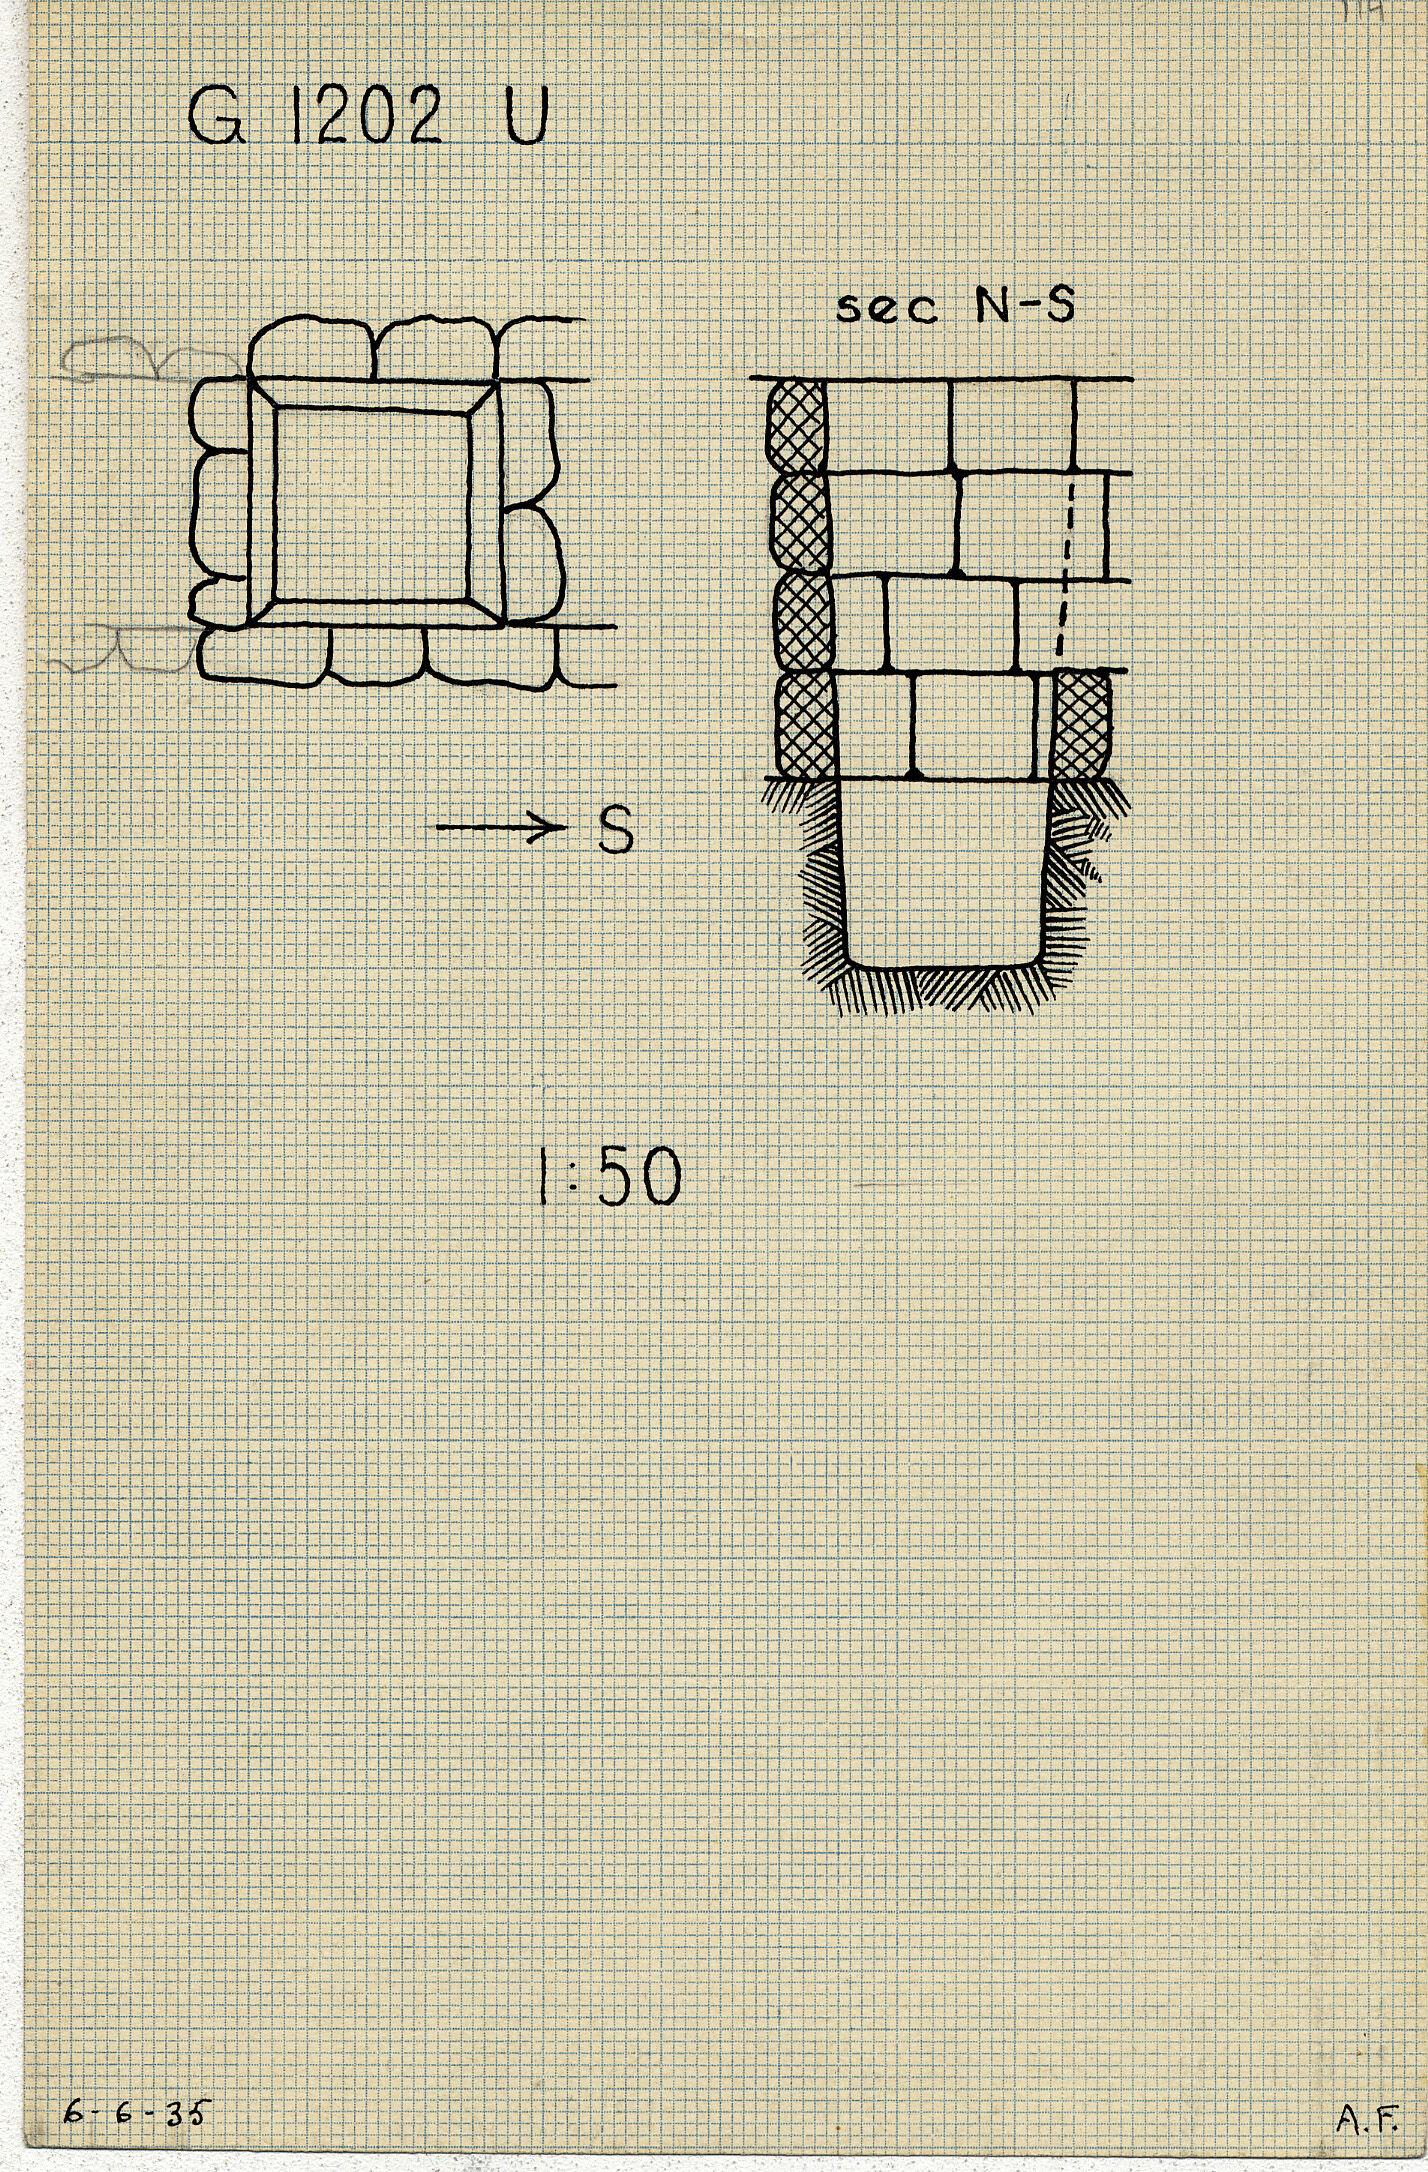 Maps and plans: G 1202, Shaft U